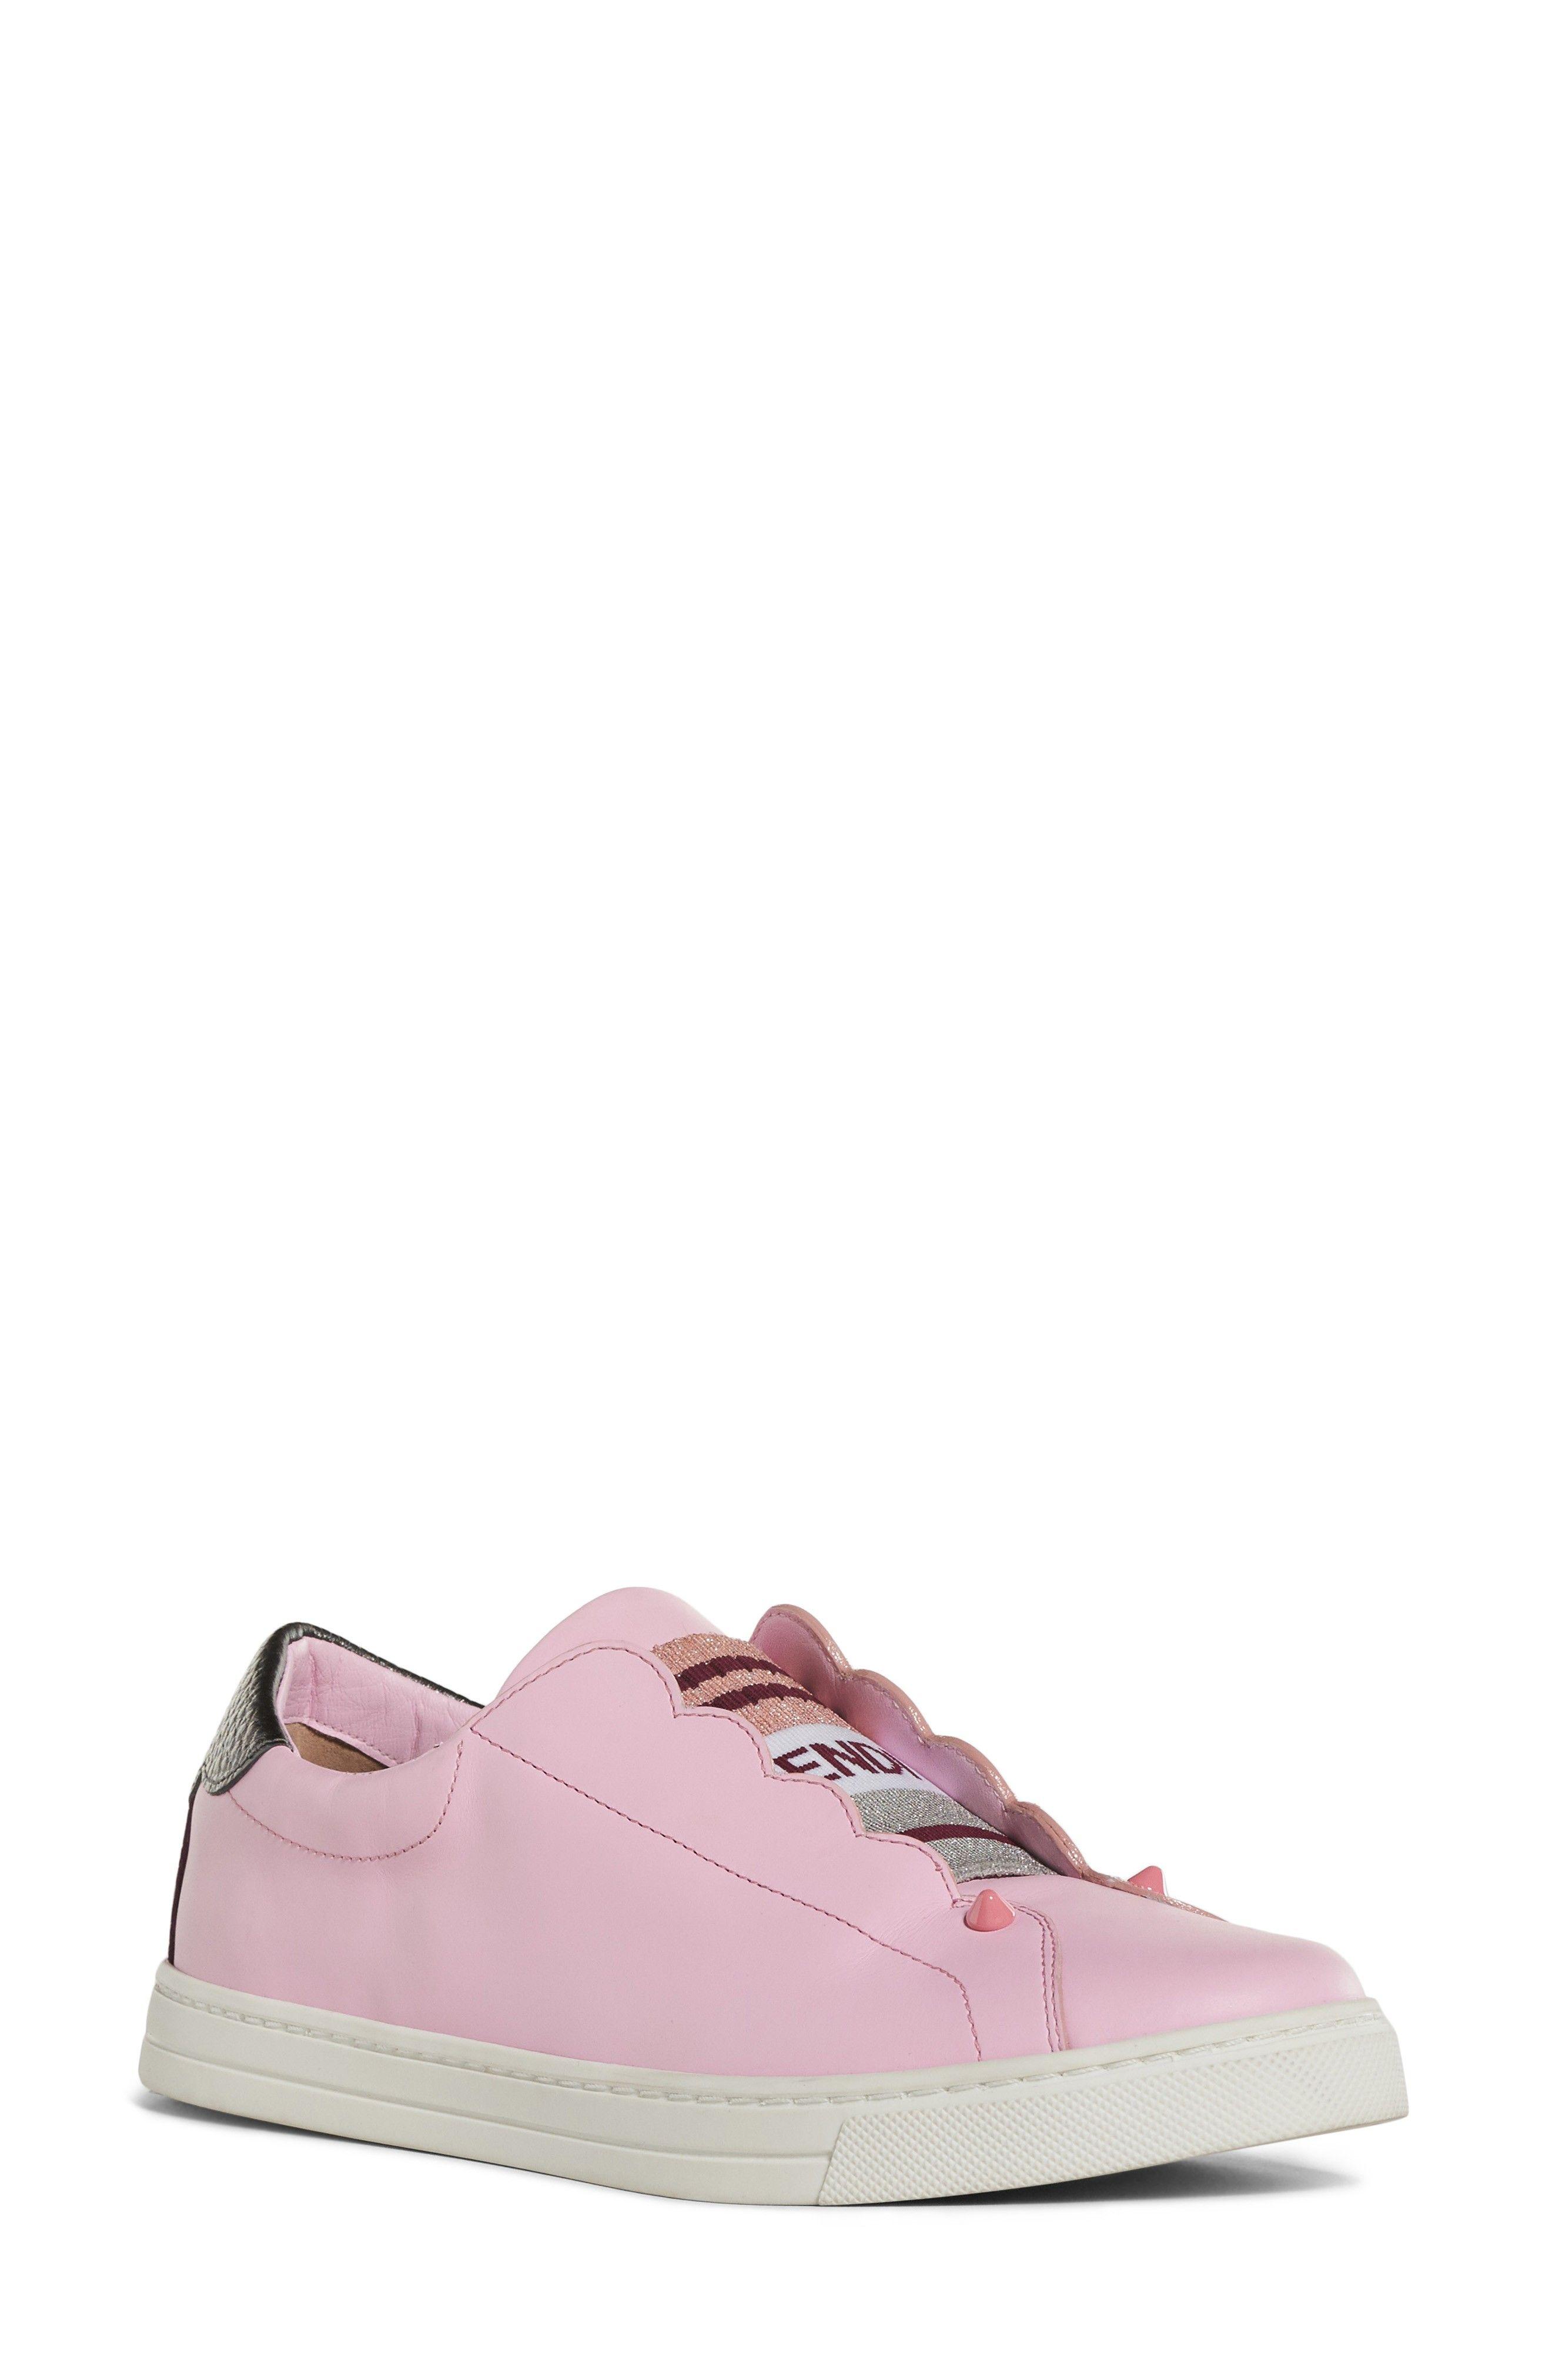 buy fendi shoes online